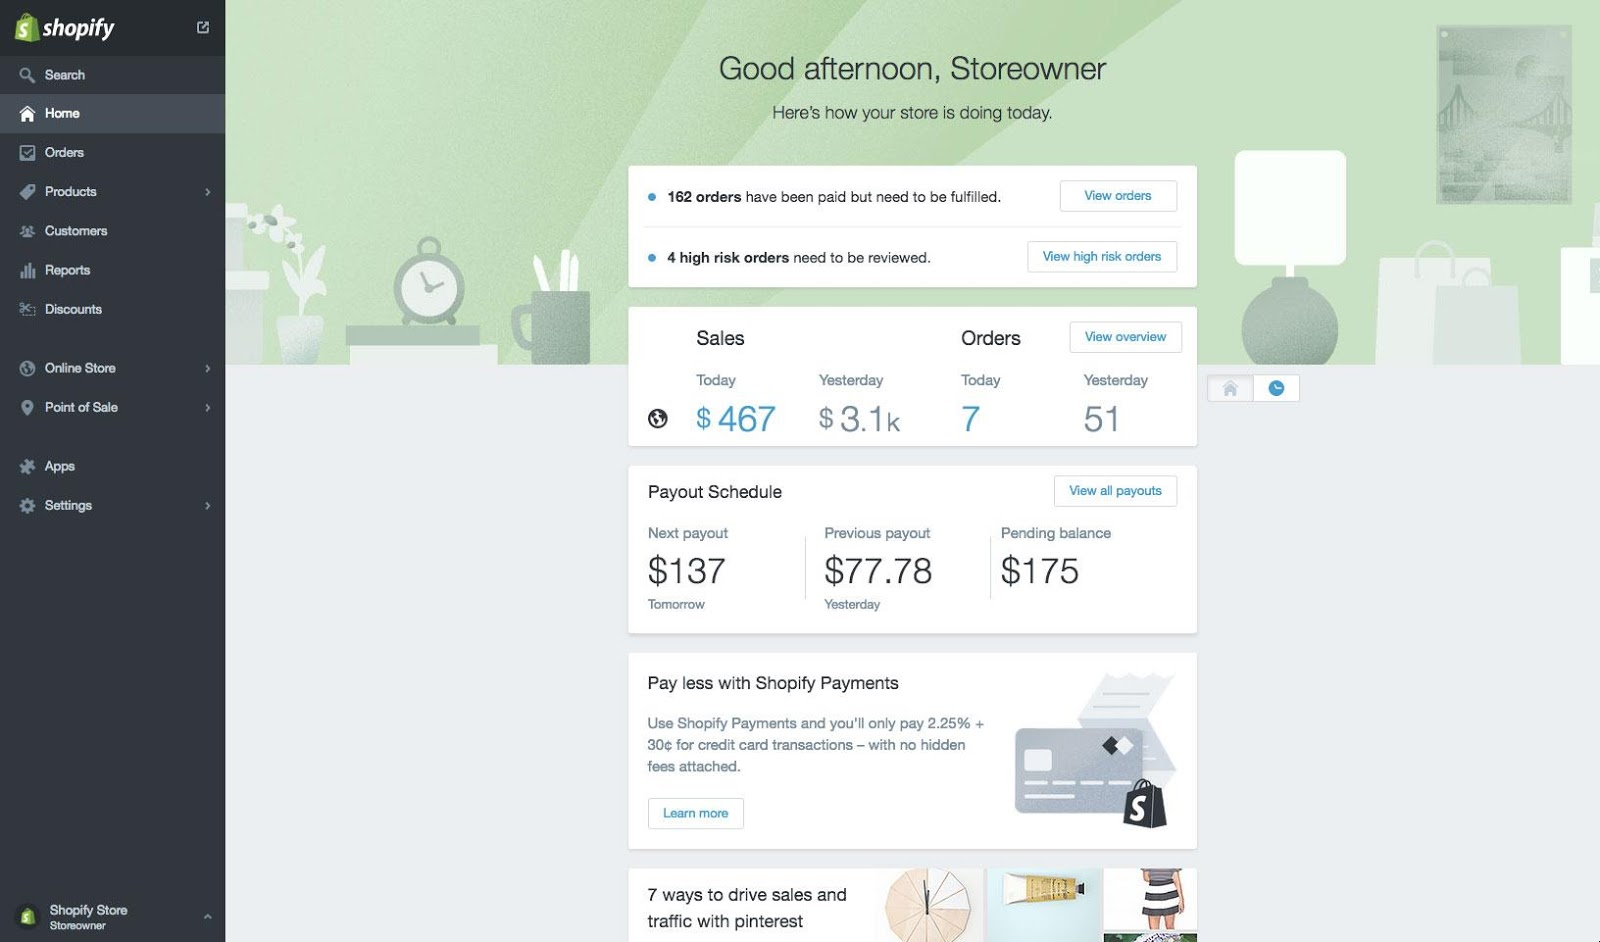 Shopify Home Dashboard